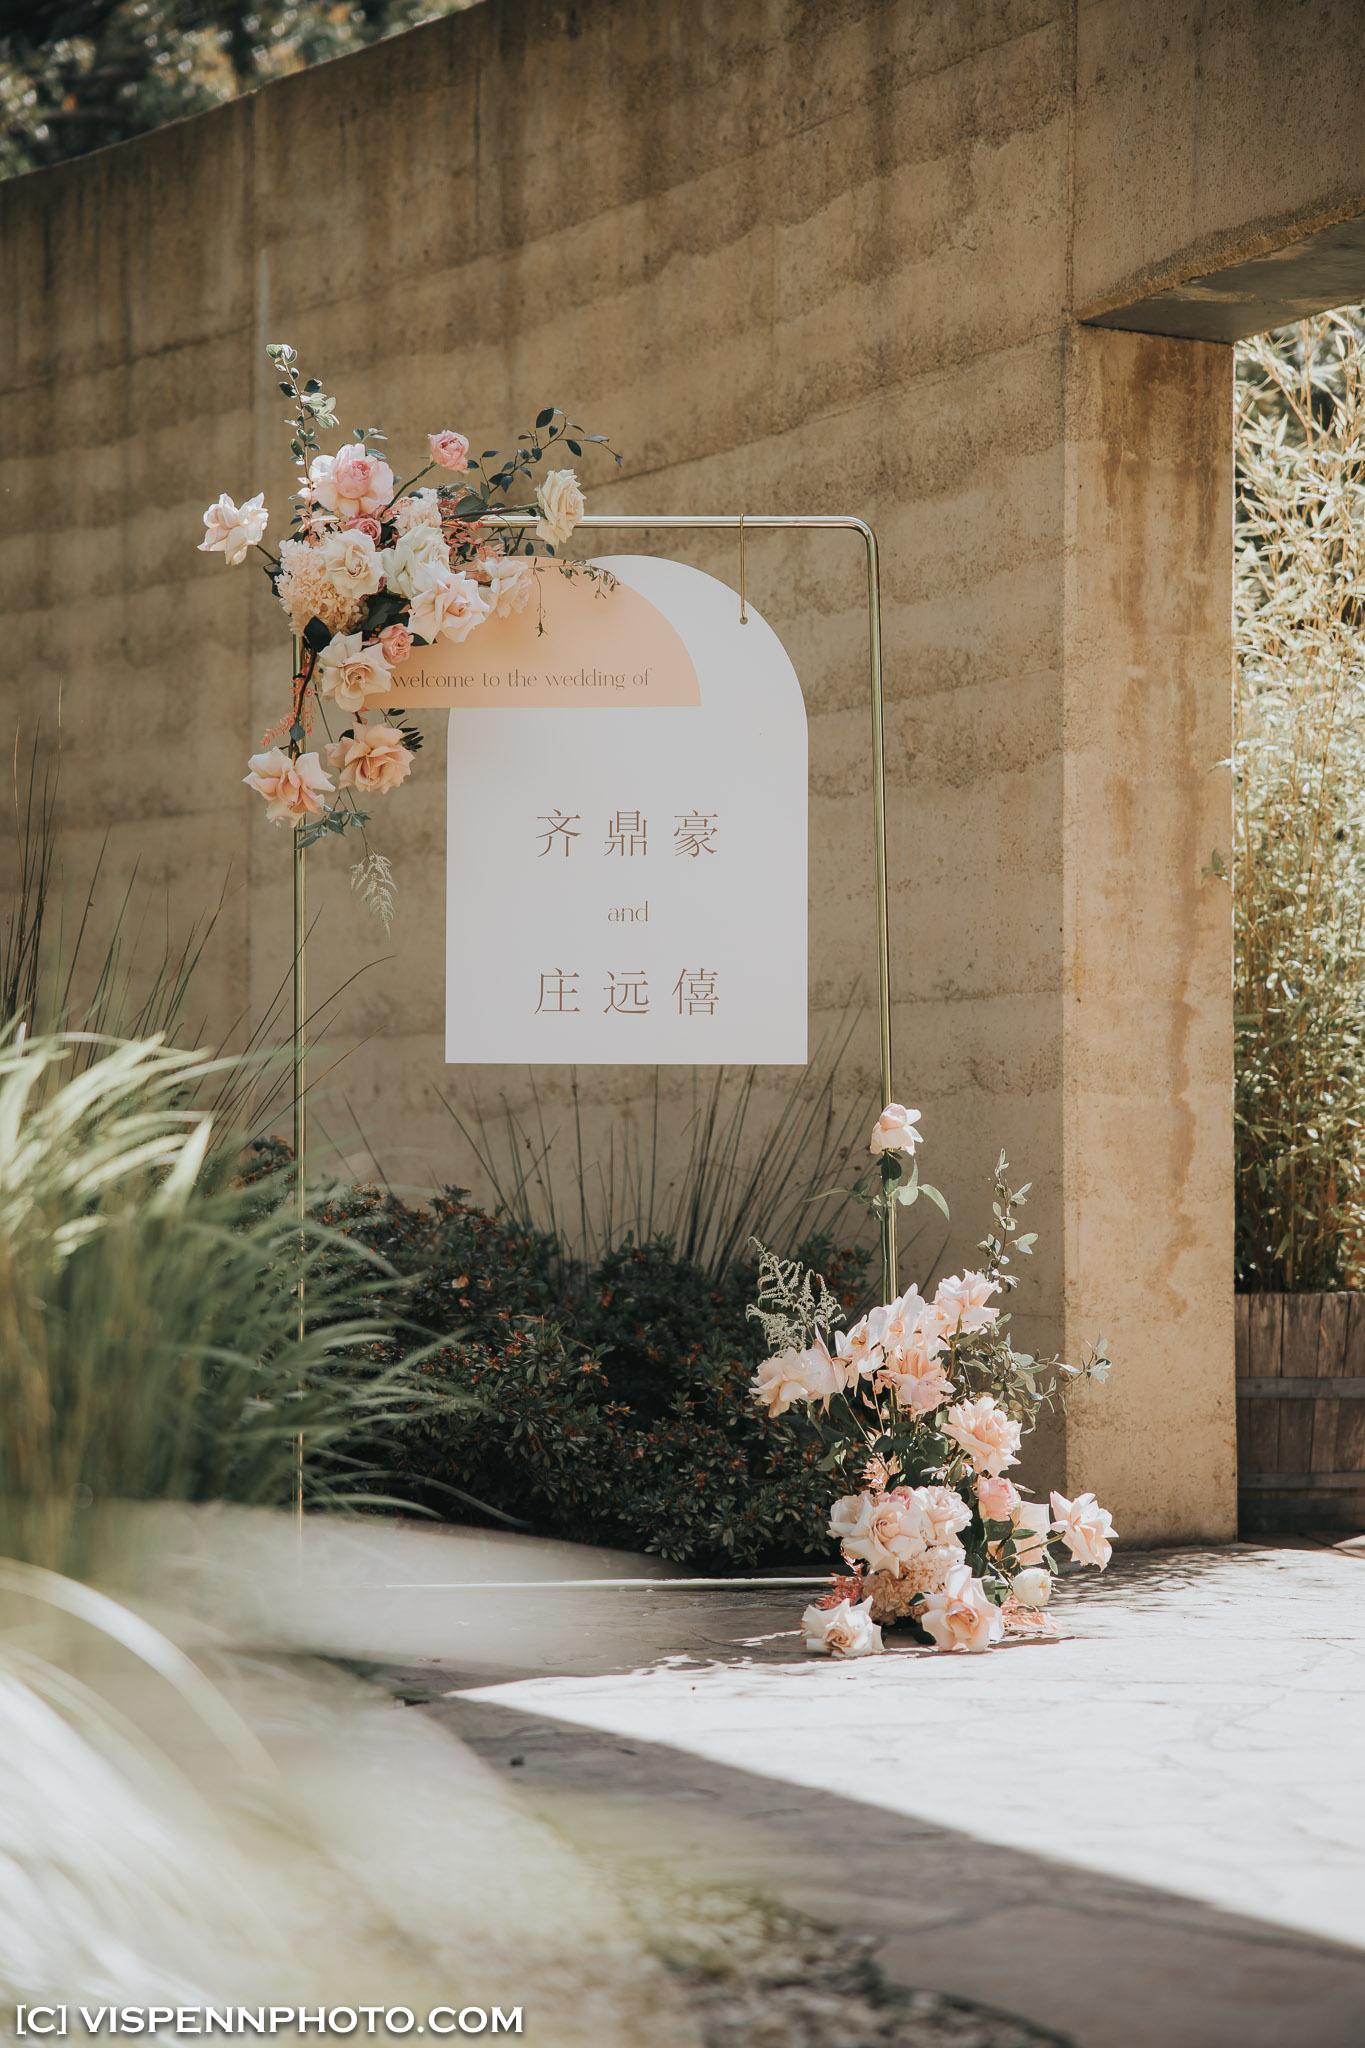 WEDDING DAY Photography Melbourne ElitaPB 07282 1P EOSR ZHPENN